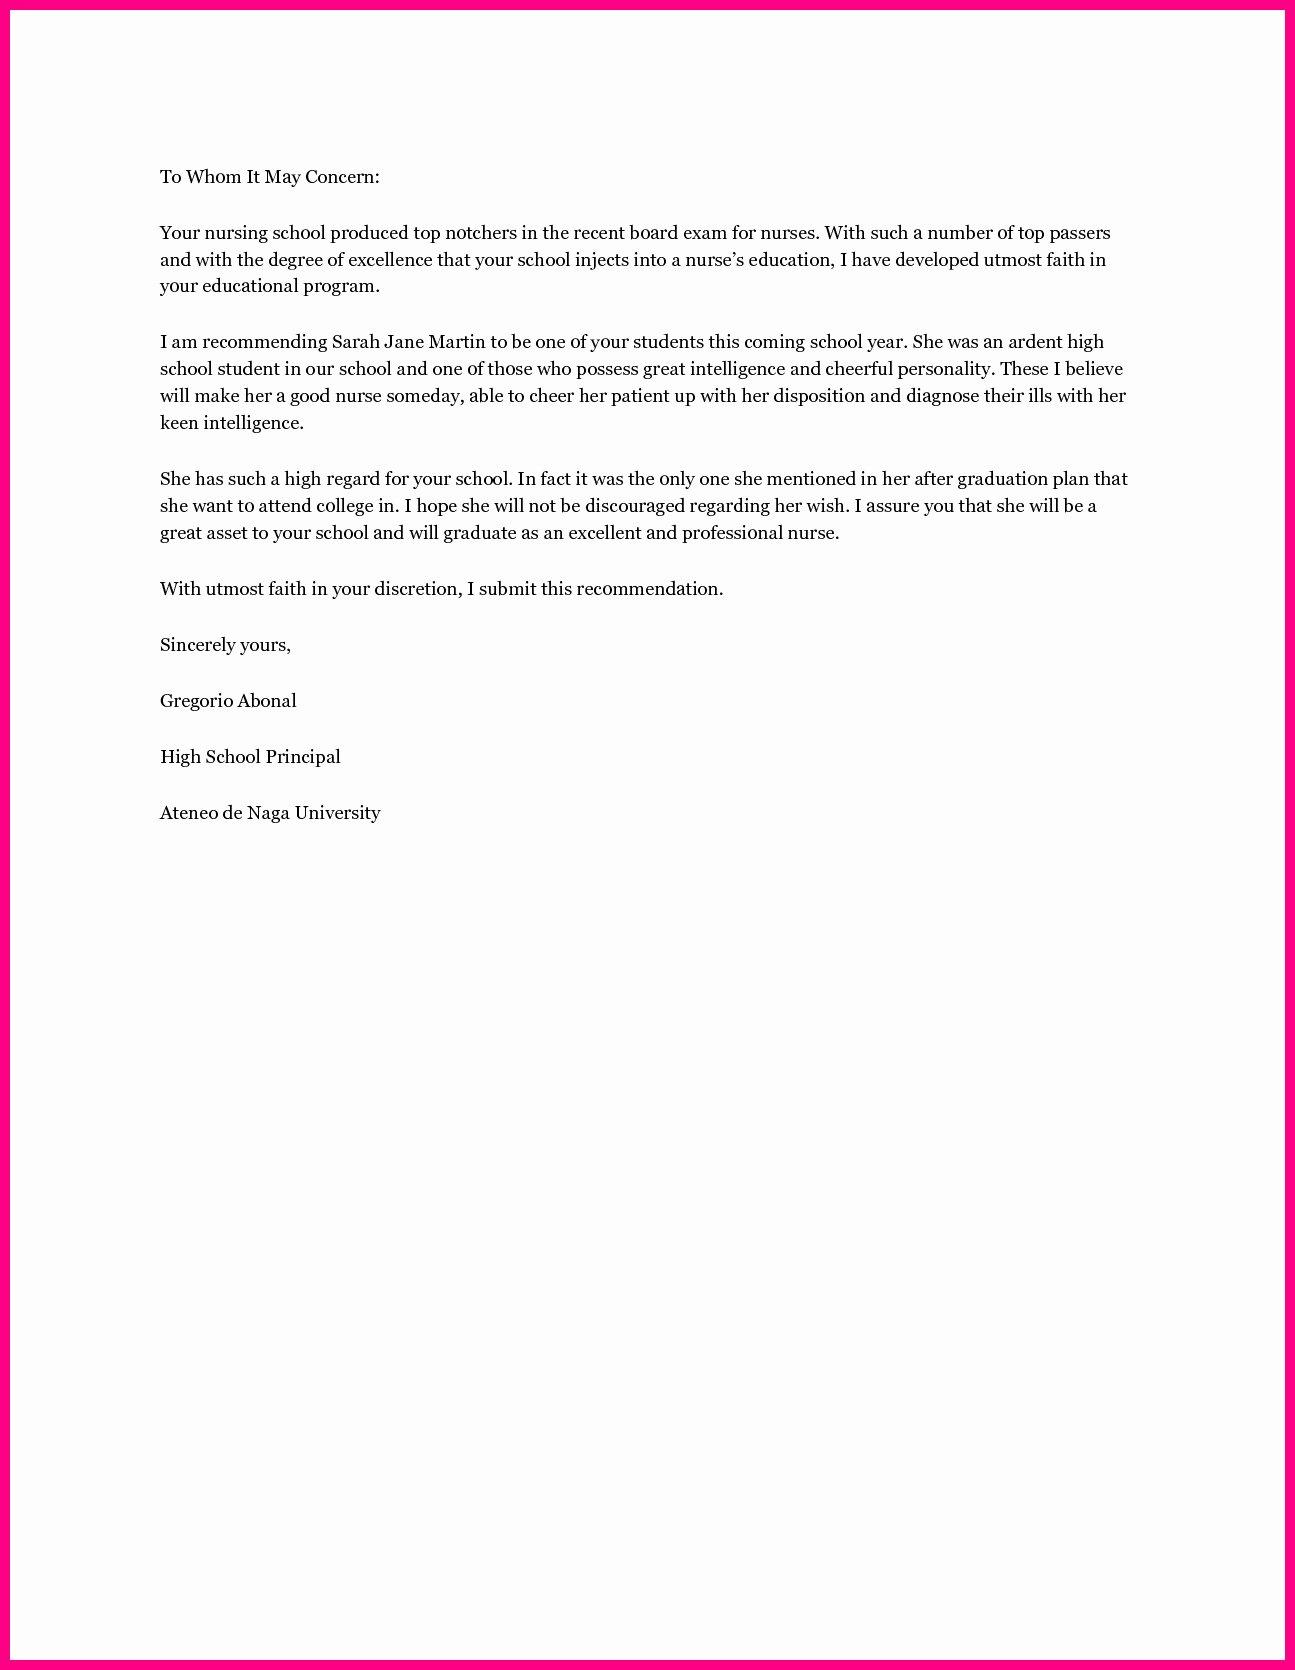 Recommendation Letter for Nursing Student Beautiful Nursing School Re Mendation Letter Template Samples